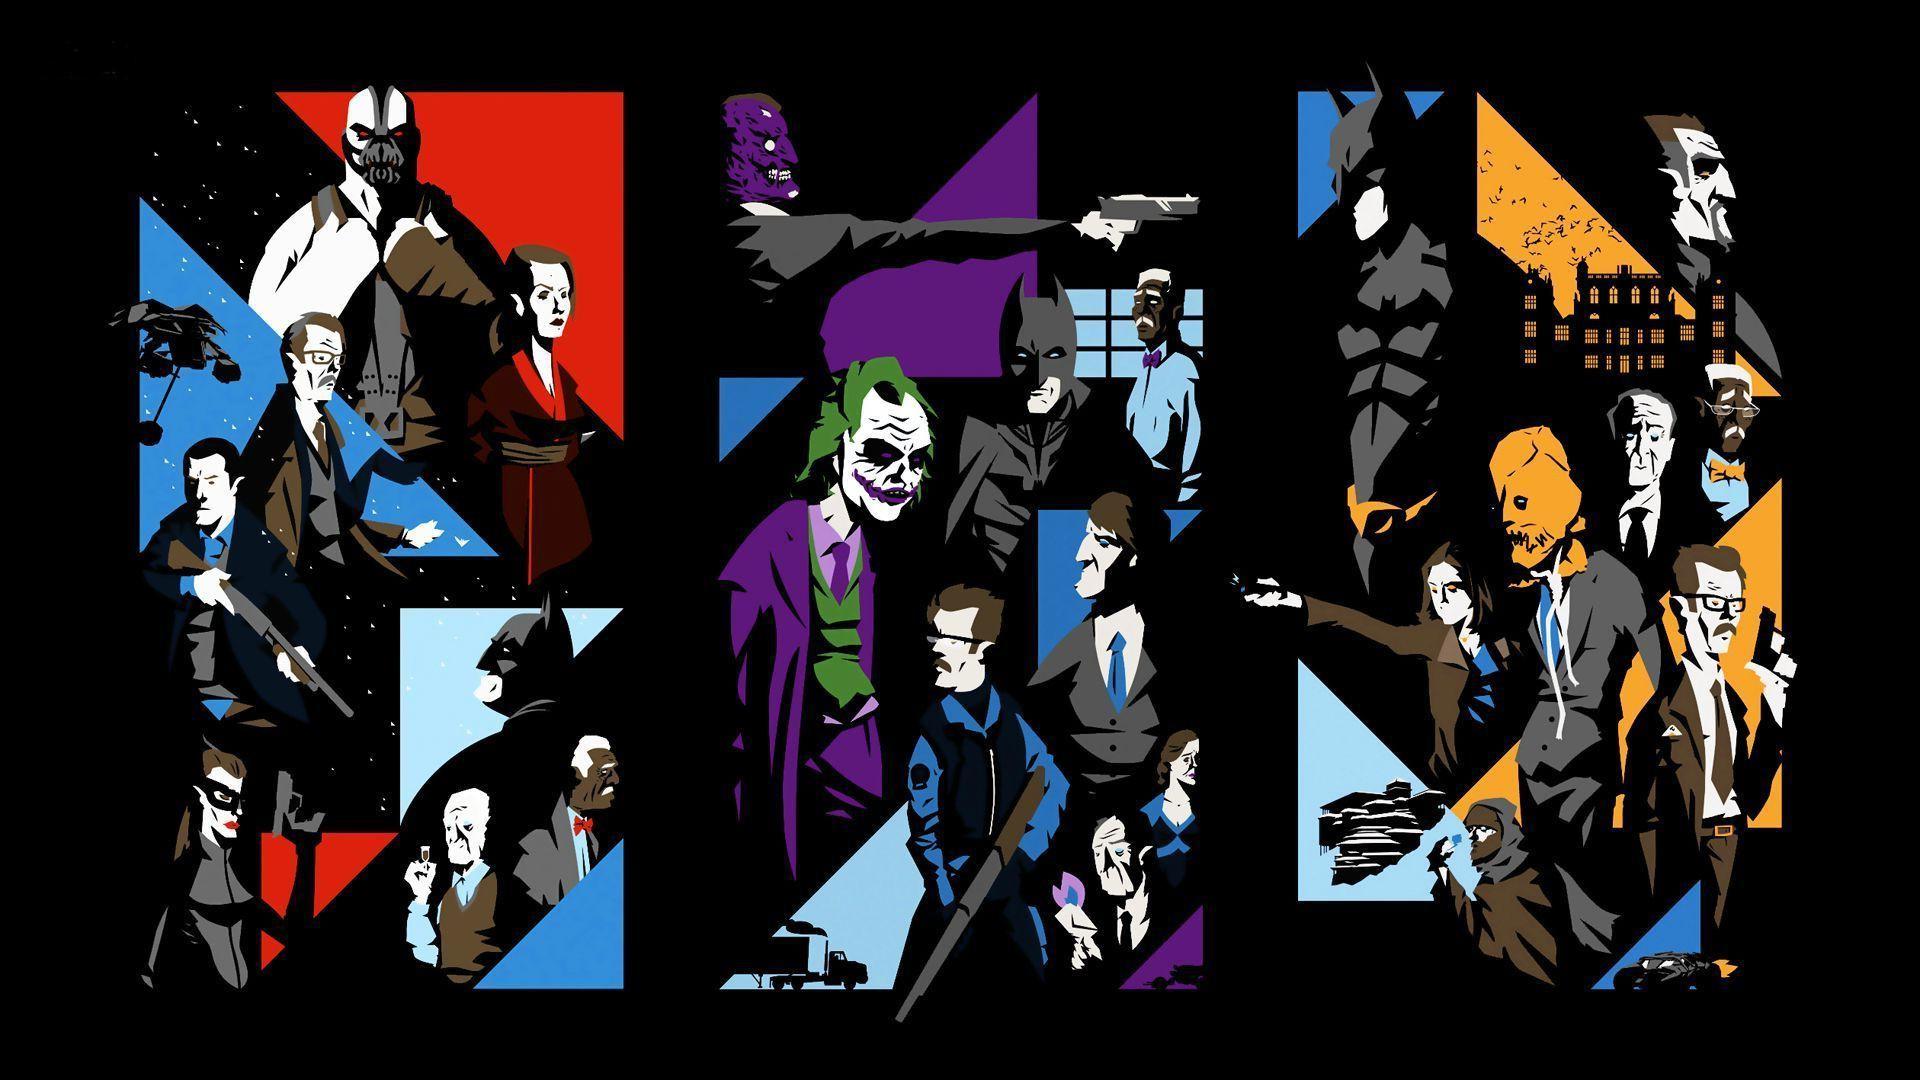 Wallpaper Illustration Video Games The Dark Knight Catwoman